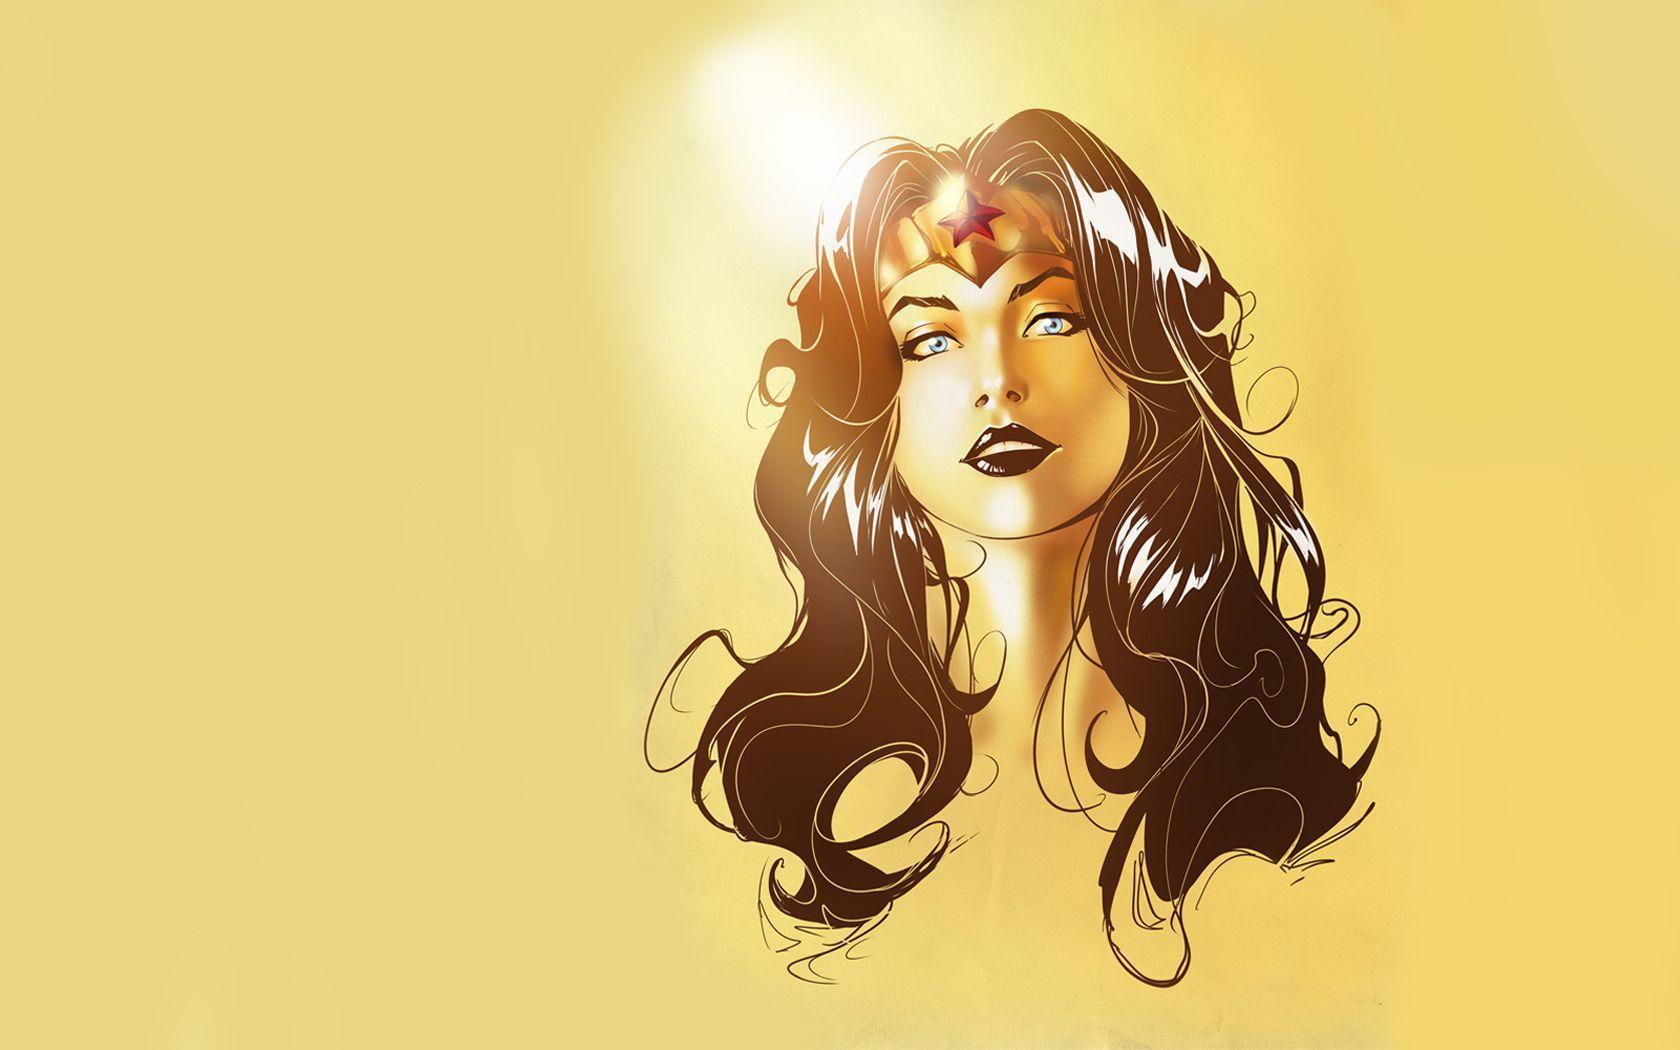 Wonder Woman Computer Wallpapers, Desktop Backgrounds | 1680x1050 ...